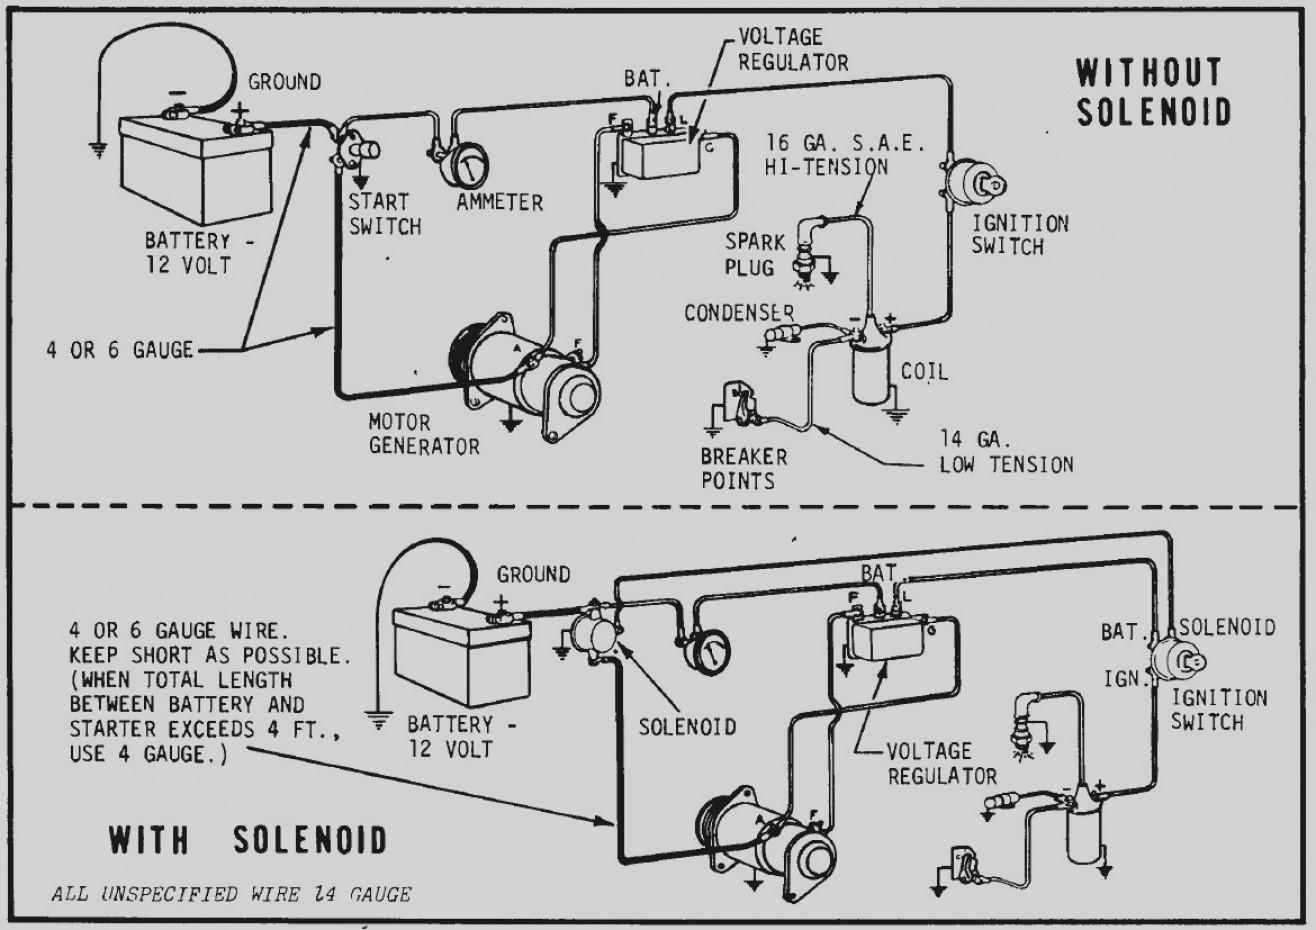 MO_1406] Delco Starter Solenoid Diagram On Delco Remy 6 Volt Wiring Diagram  Free Diagram | Recep Isolated Power System Wiring Diagram |  | Sand Ynthe Sapre Vesi Para Numap Mohammedshrine Librar Wiring 101